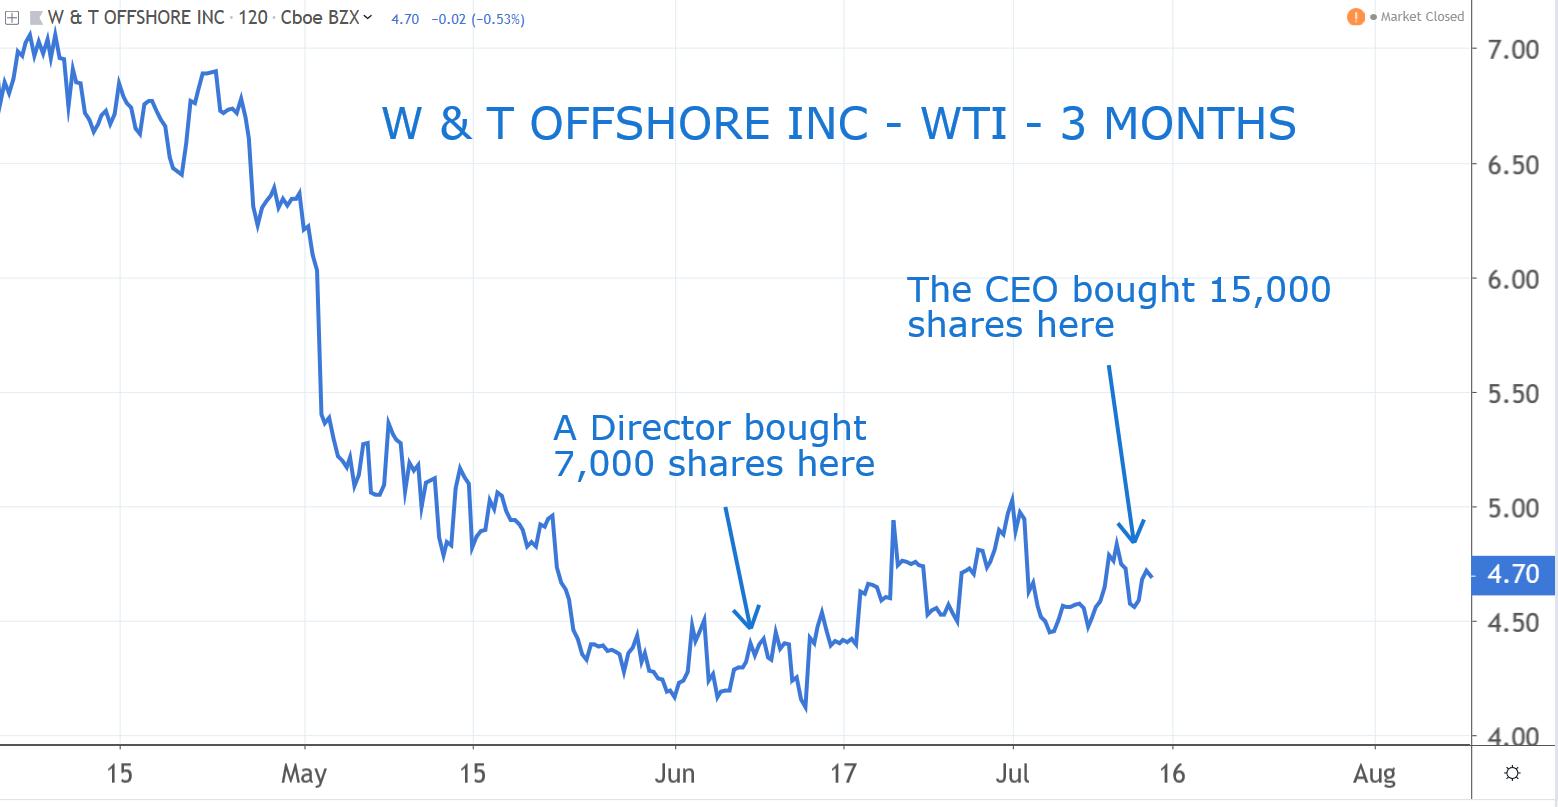 W & T Offshore (WTI)